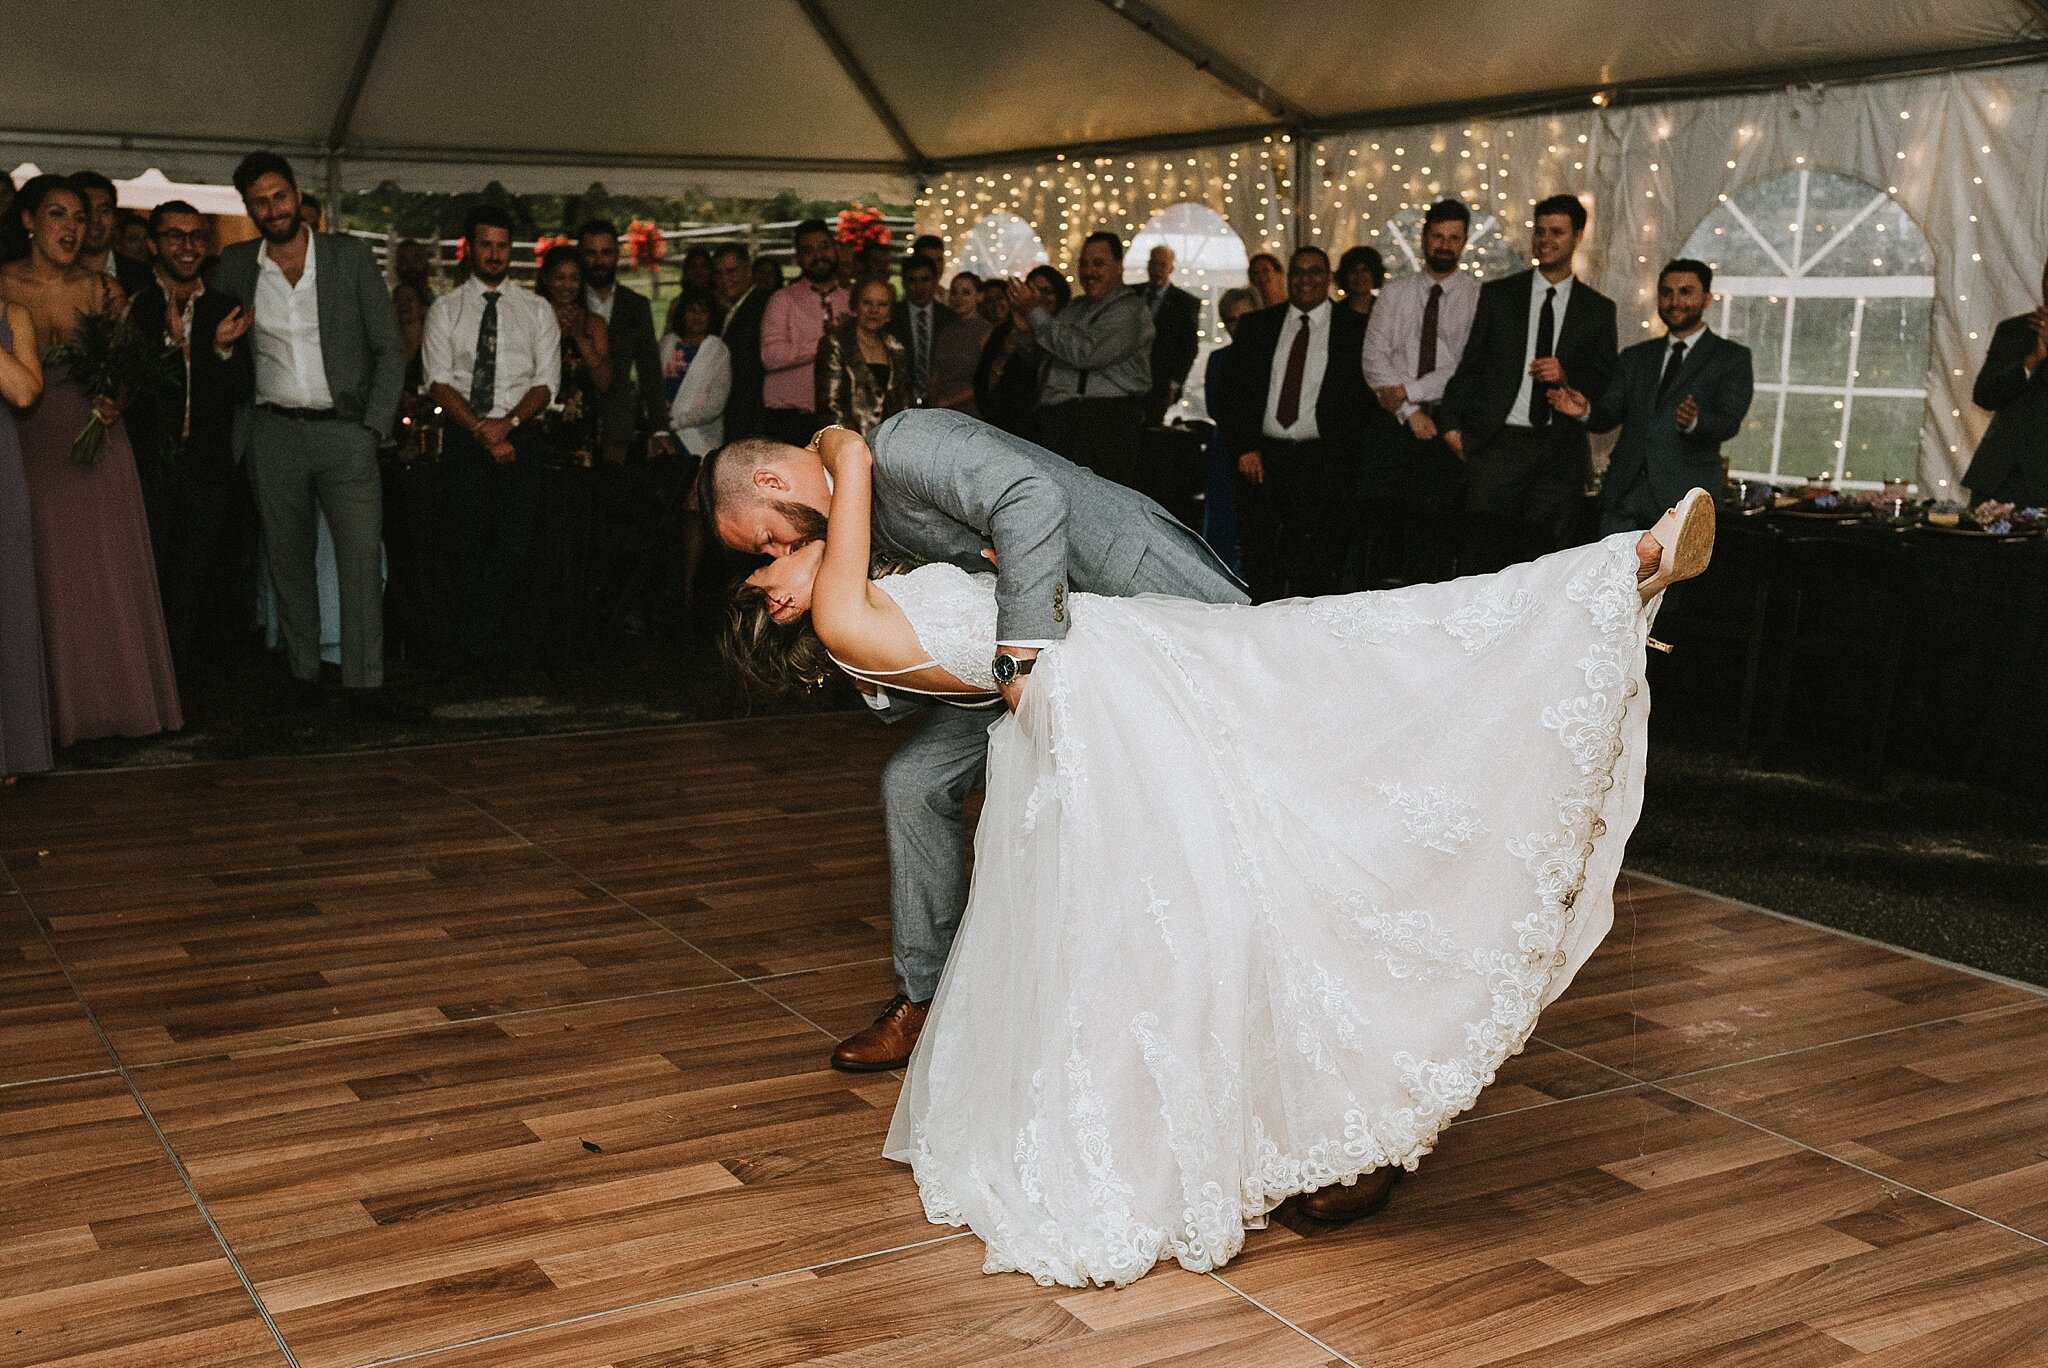 connecticut_wedding_3101.jpg